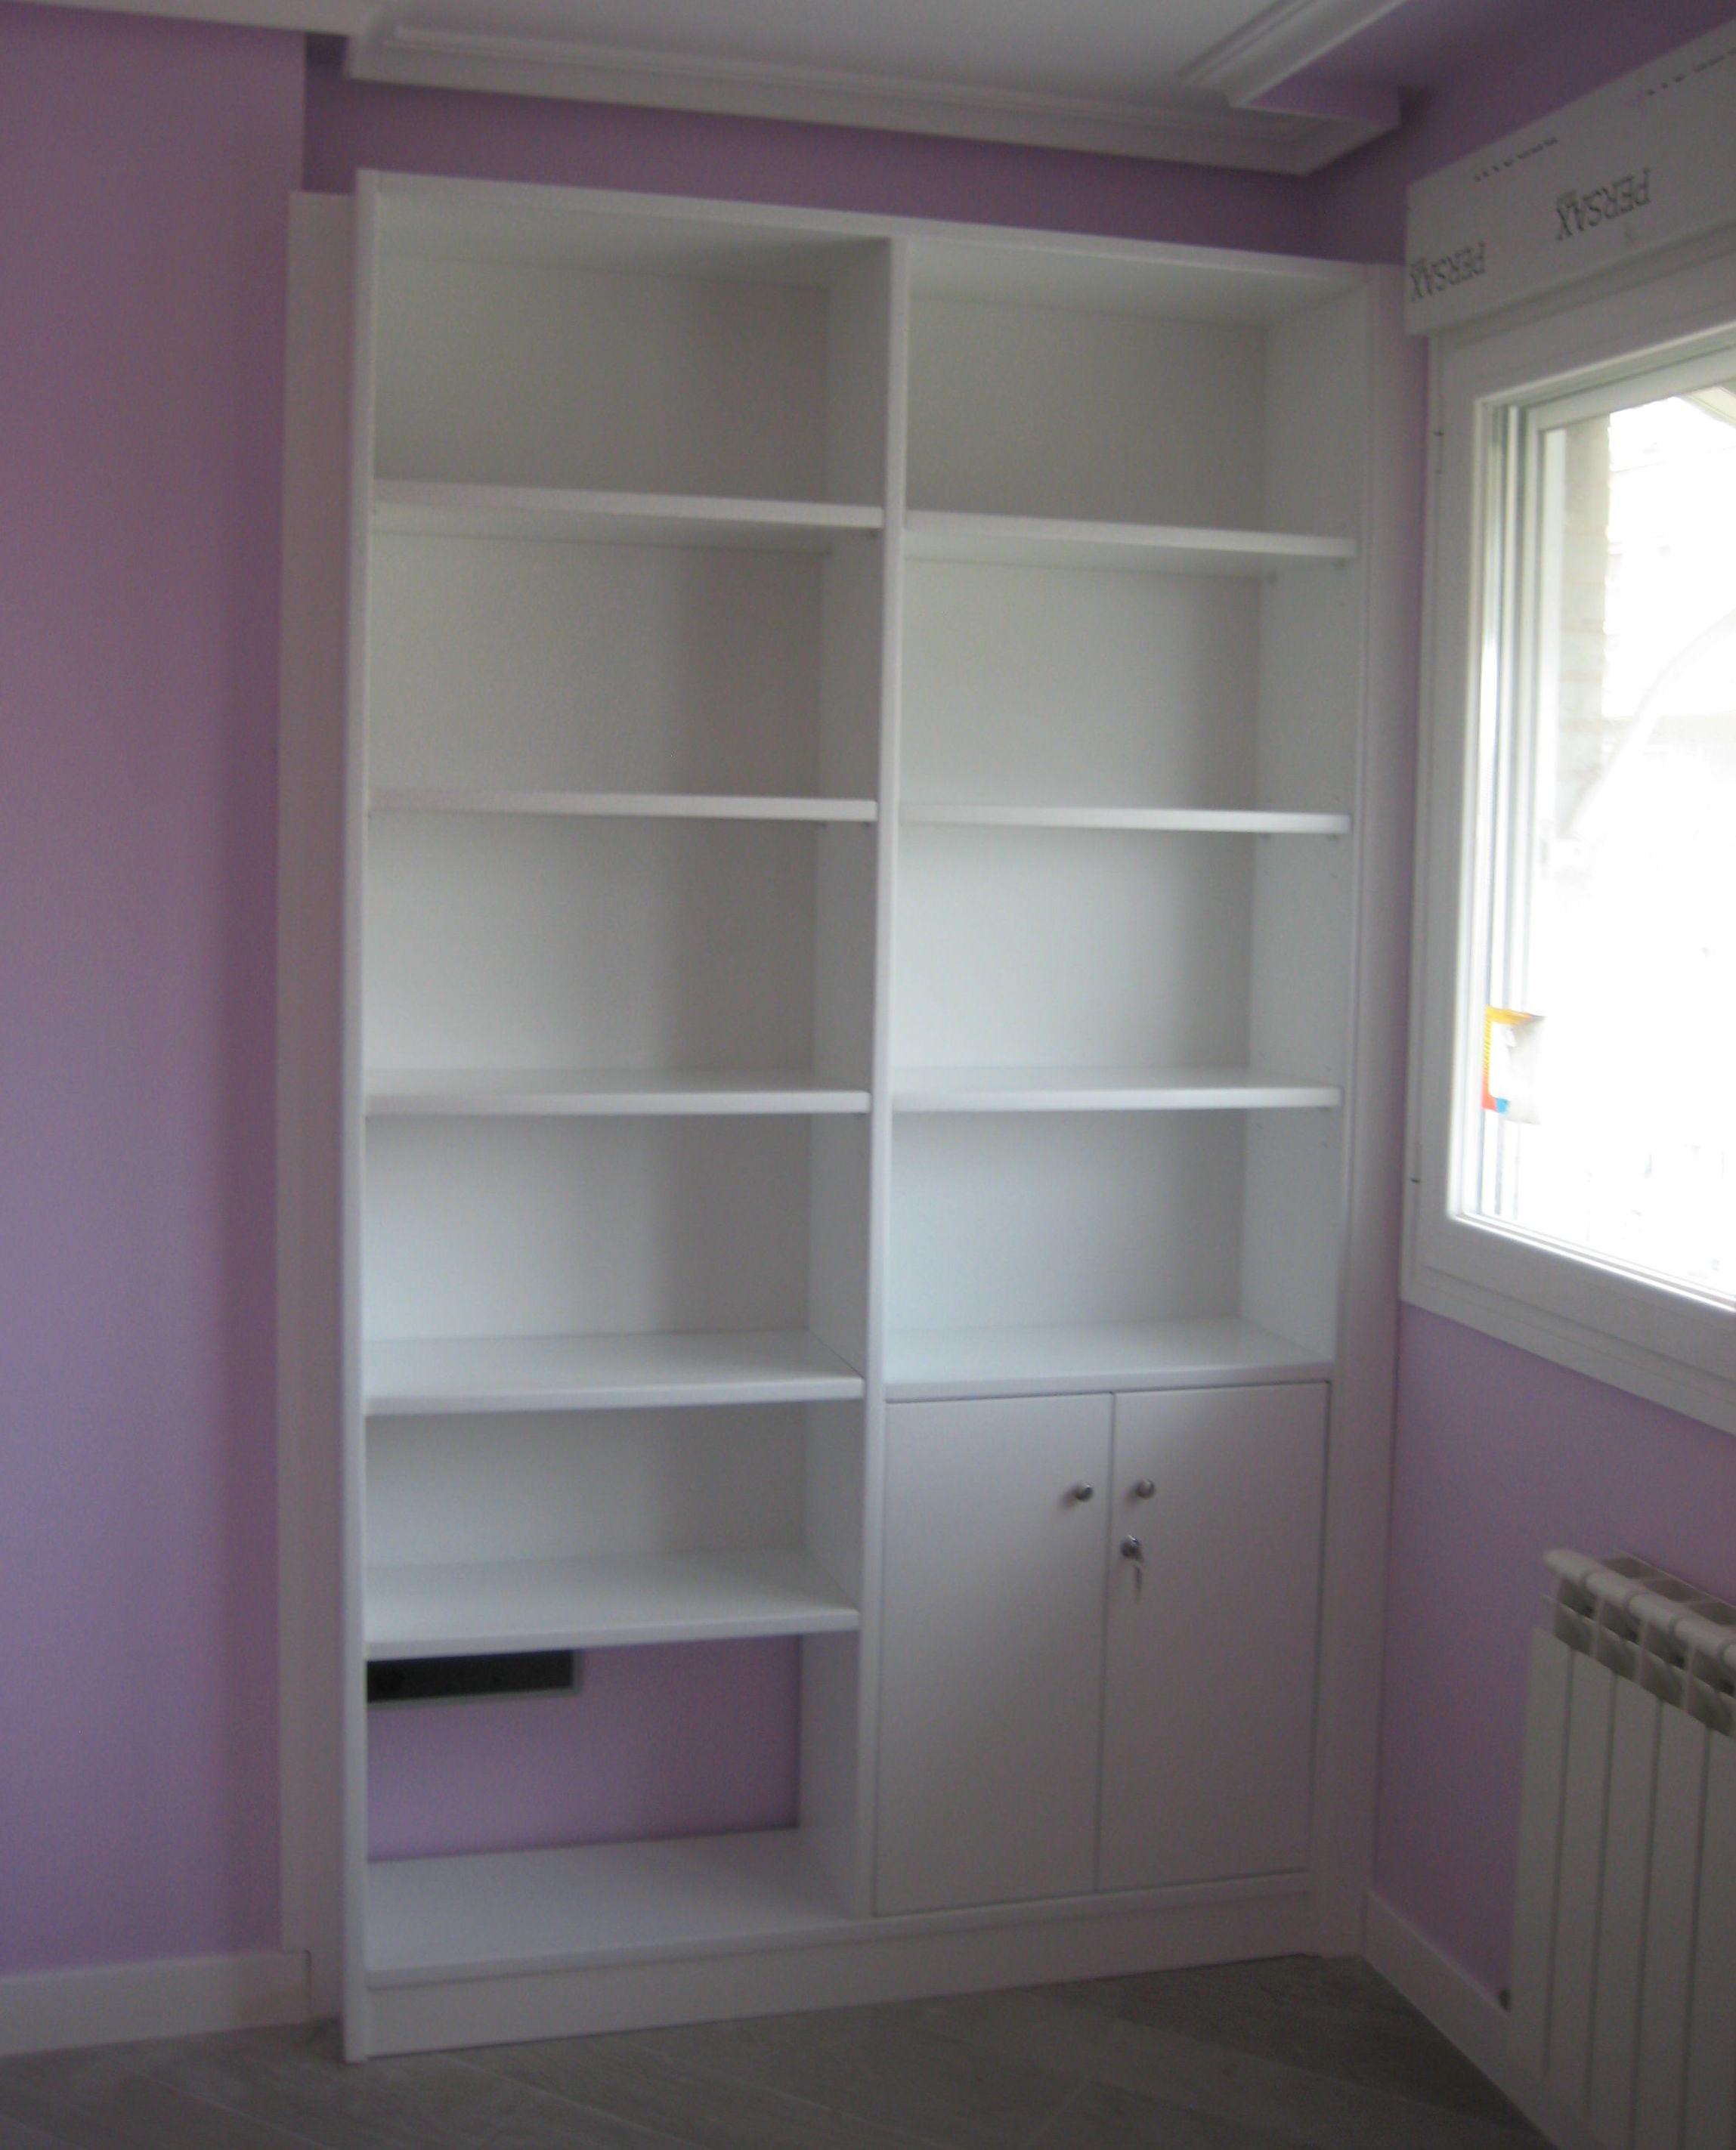 Por qu elegir muebles a medida - Mas que muebles ...